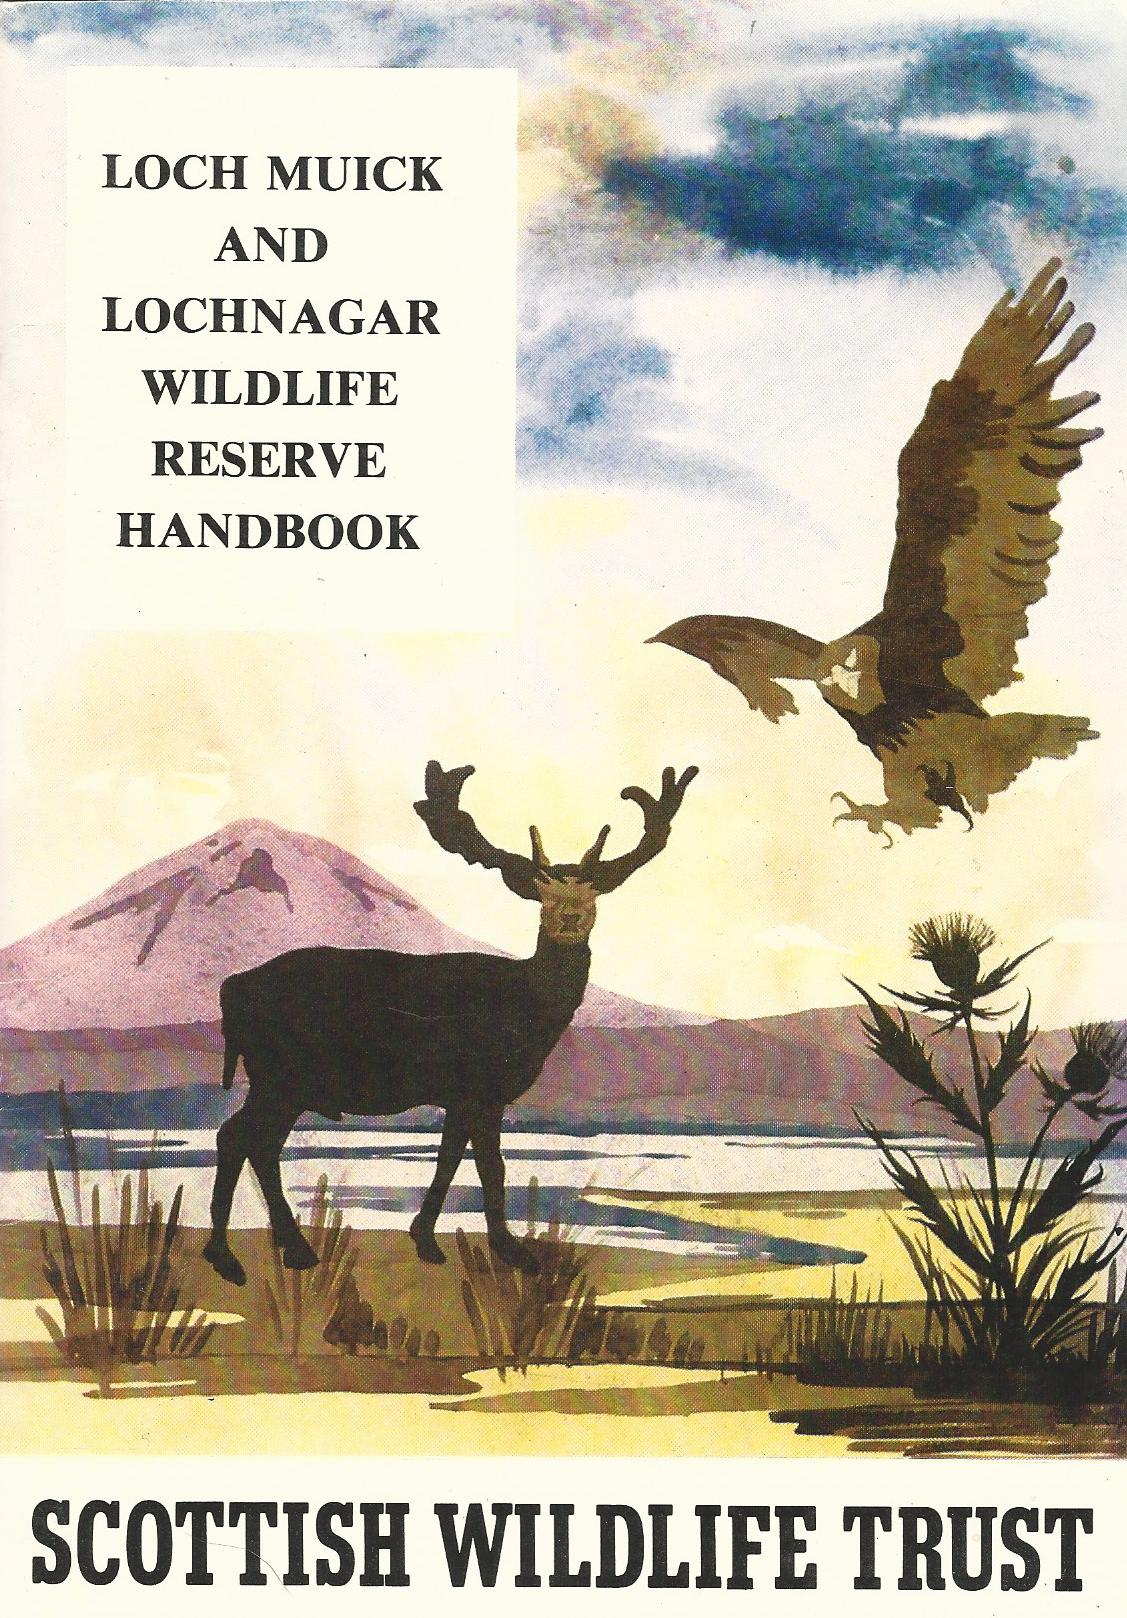 Loch Muick and Lochnagar.